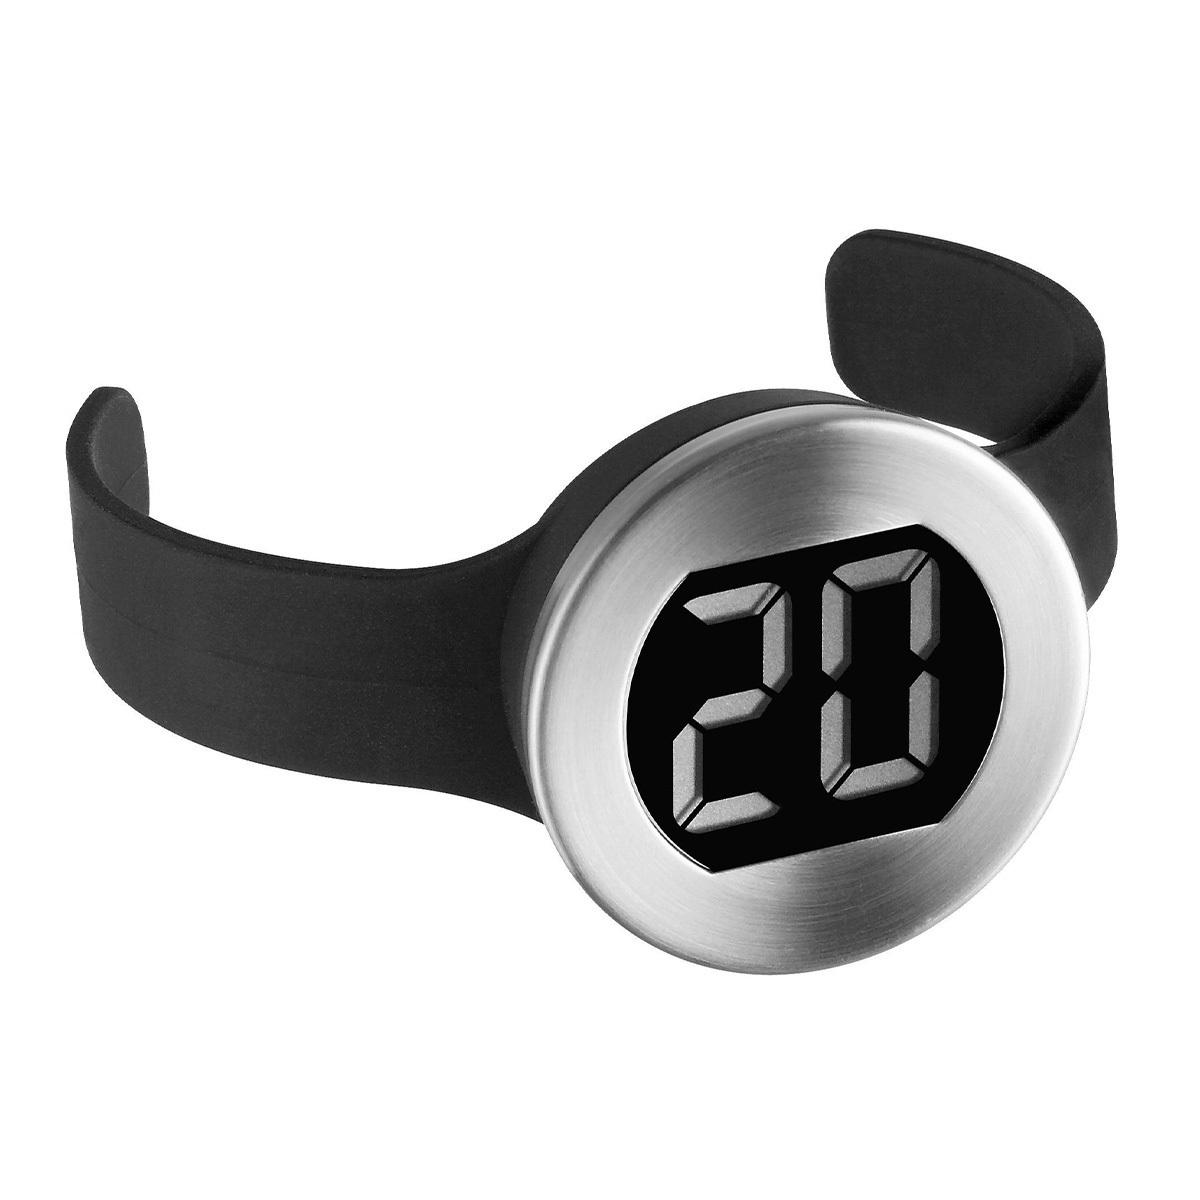 14-2008-digitales-weinthermometer-1200x1200px.jpg